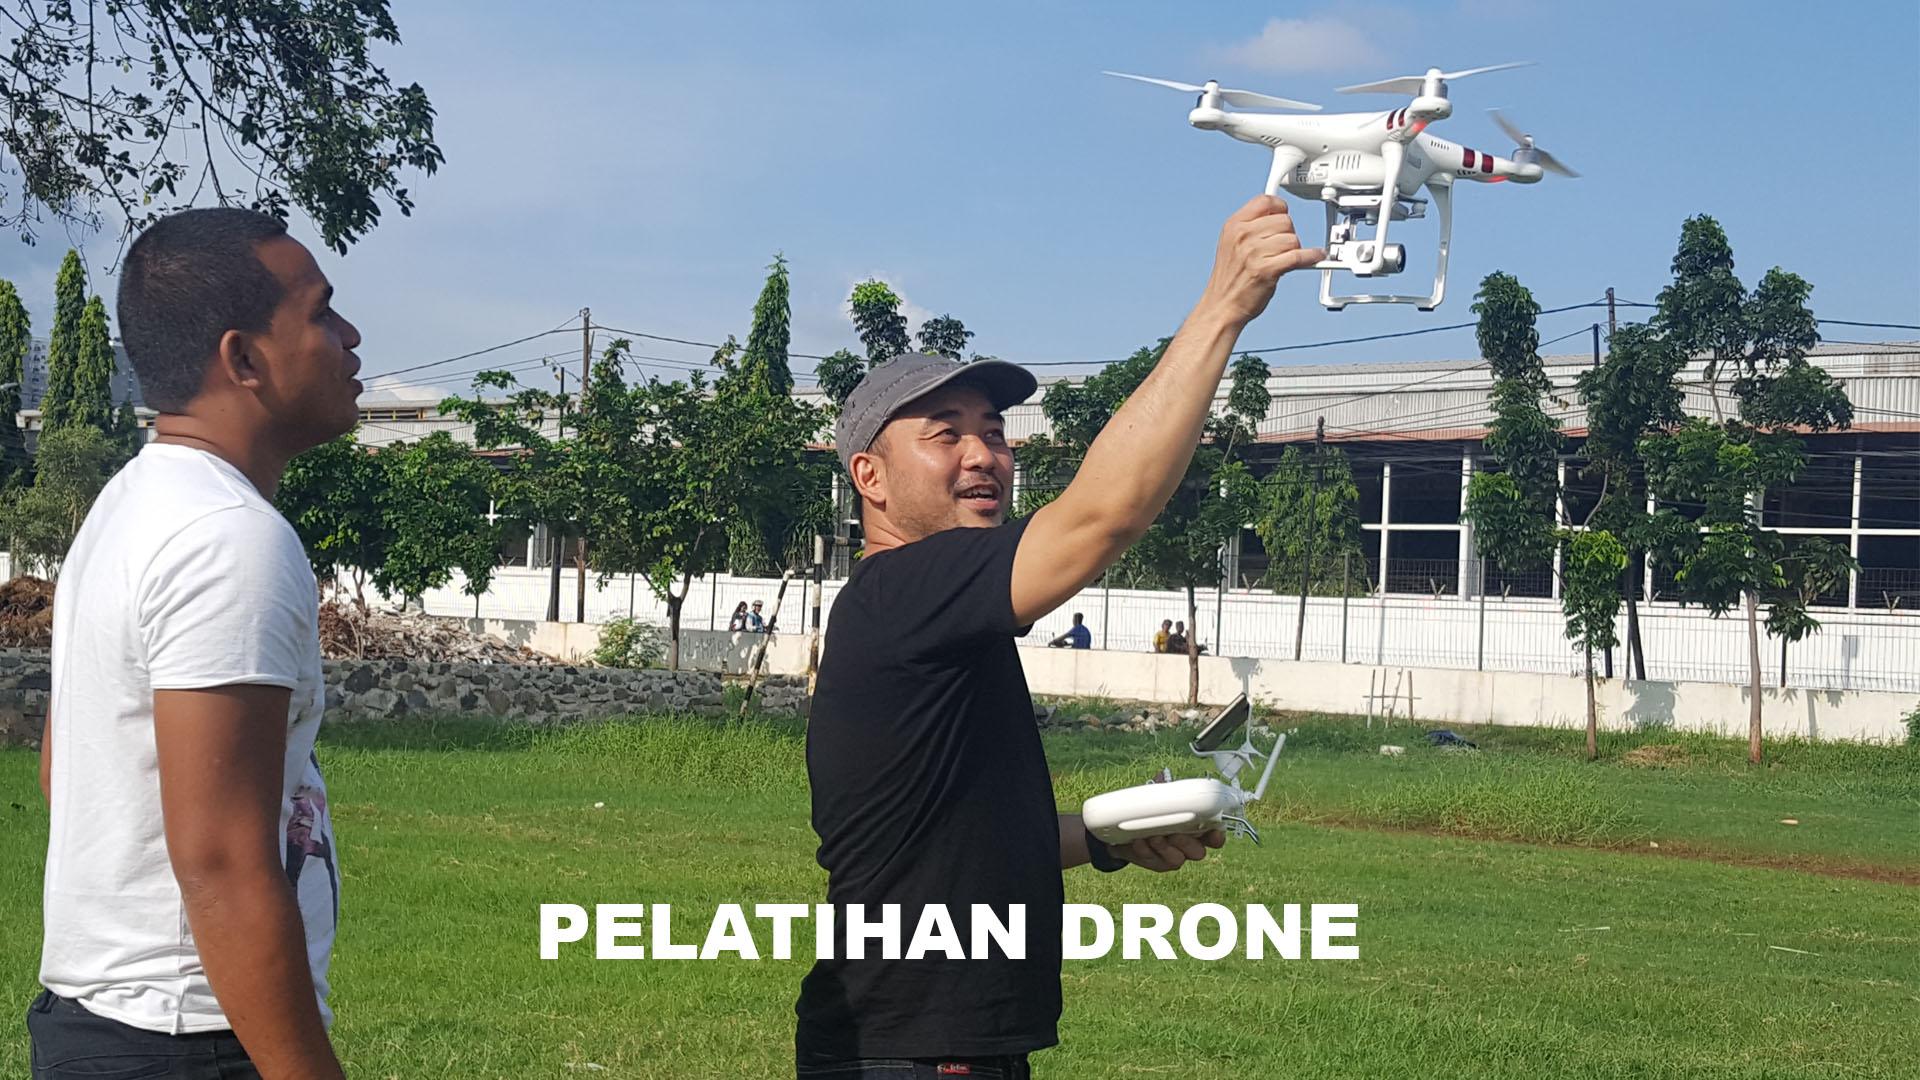 Drone trainer